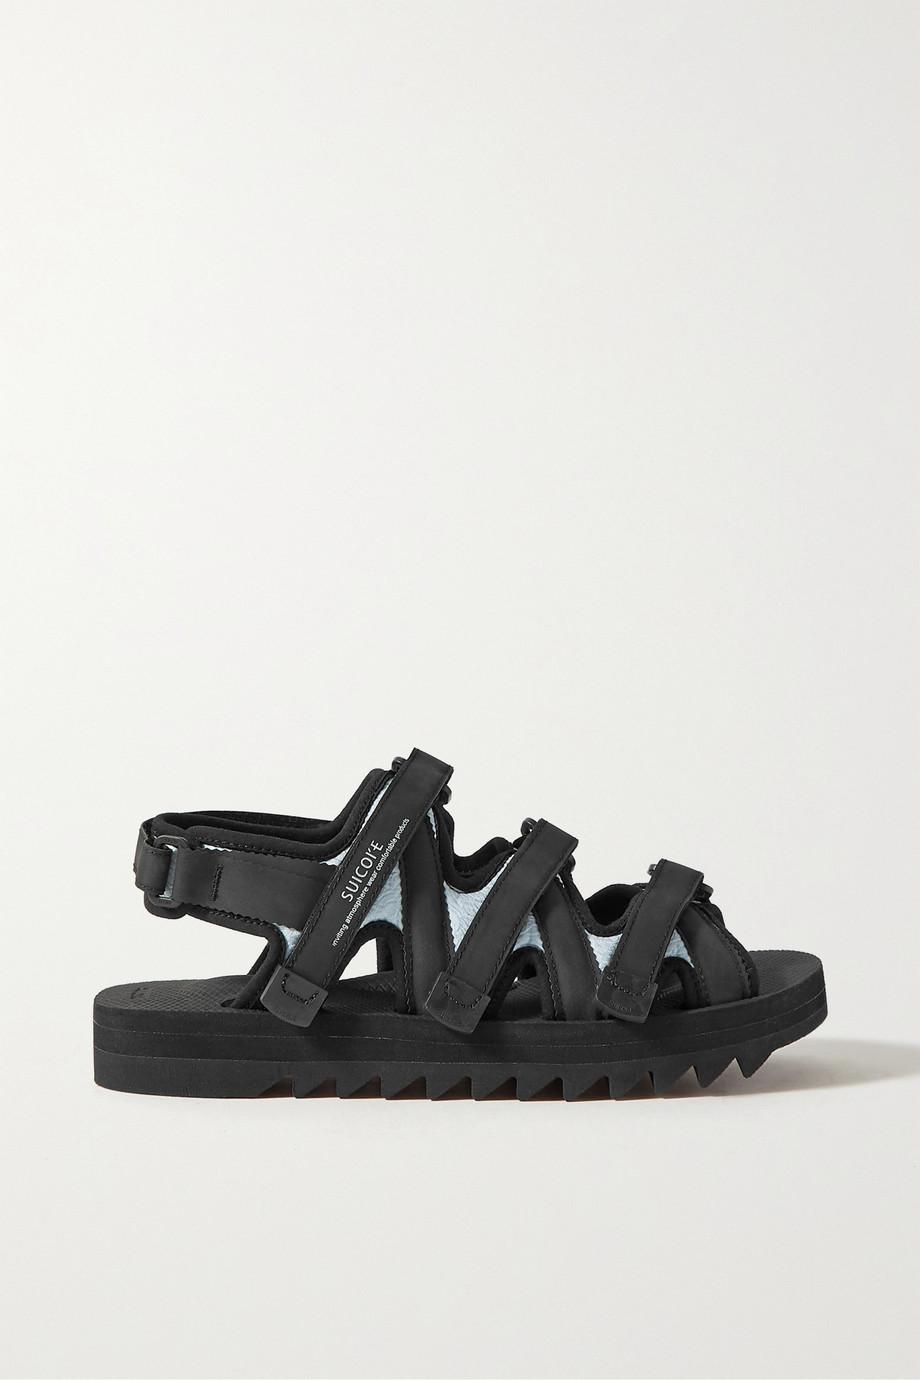 Cecilie Bahnsen + Suicoke Edda silk-cloqué, neoprene and grosgrain sandals